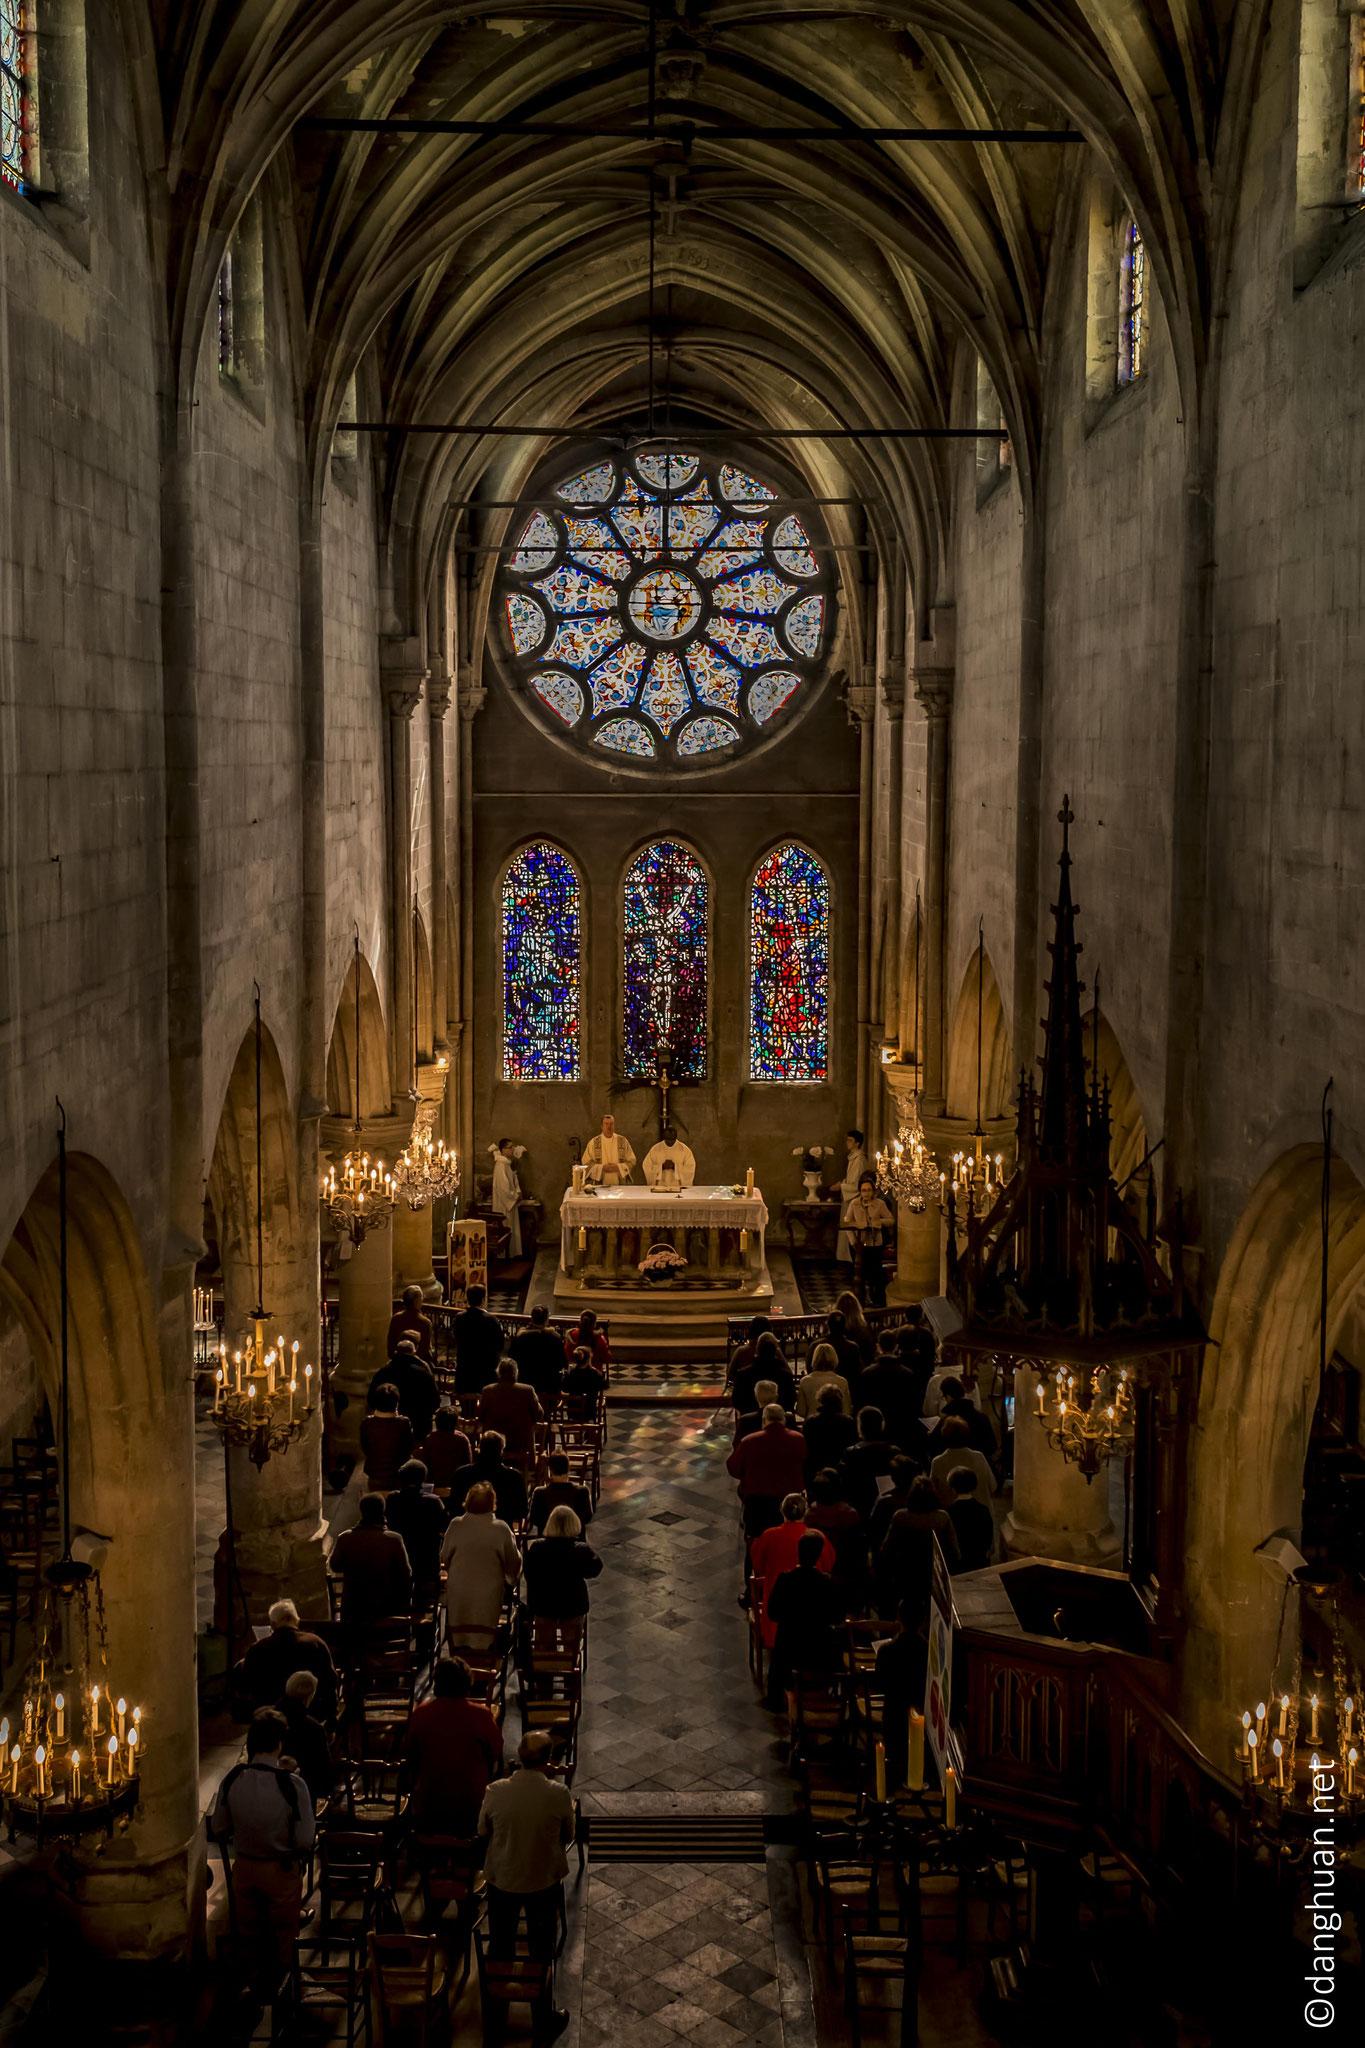 Eglise de Précy s/Oise